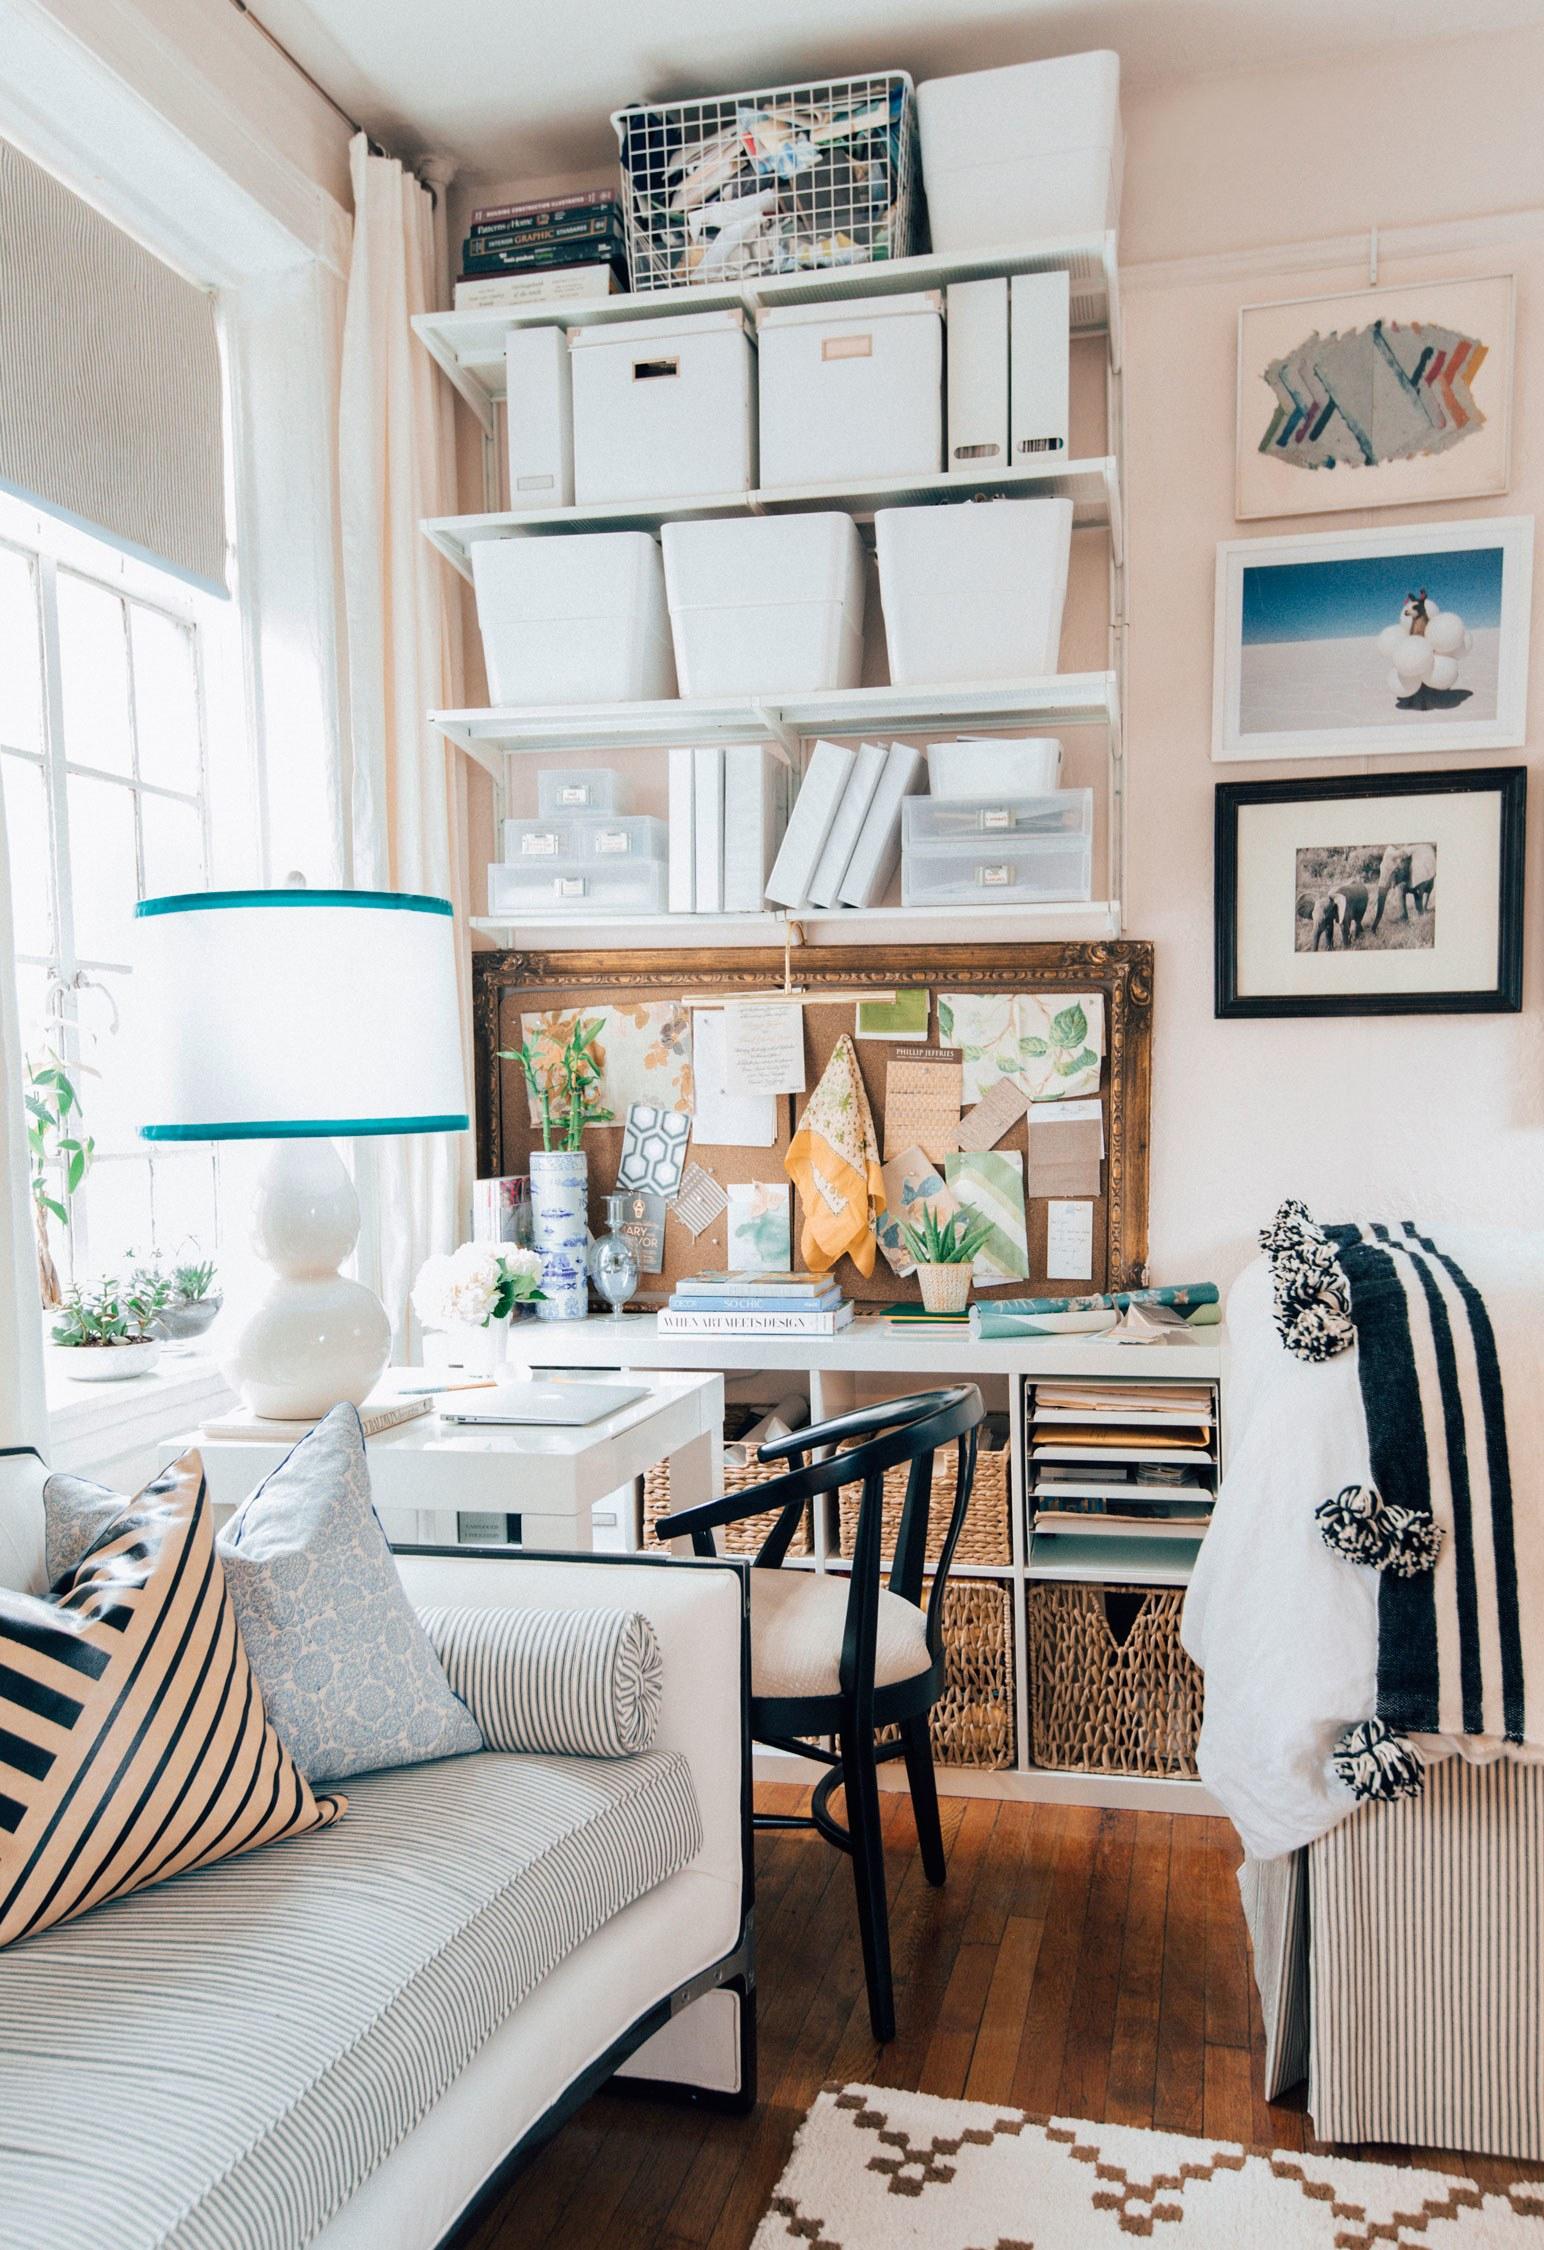 10 Fantastic Decorating Ideas For Studio Apartment how to decorate a studio apartment tips for studio living decor 1 2020